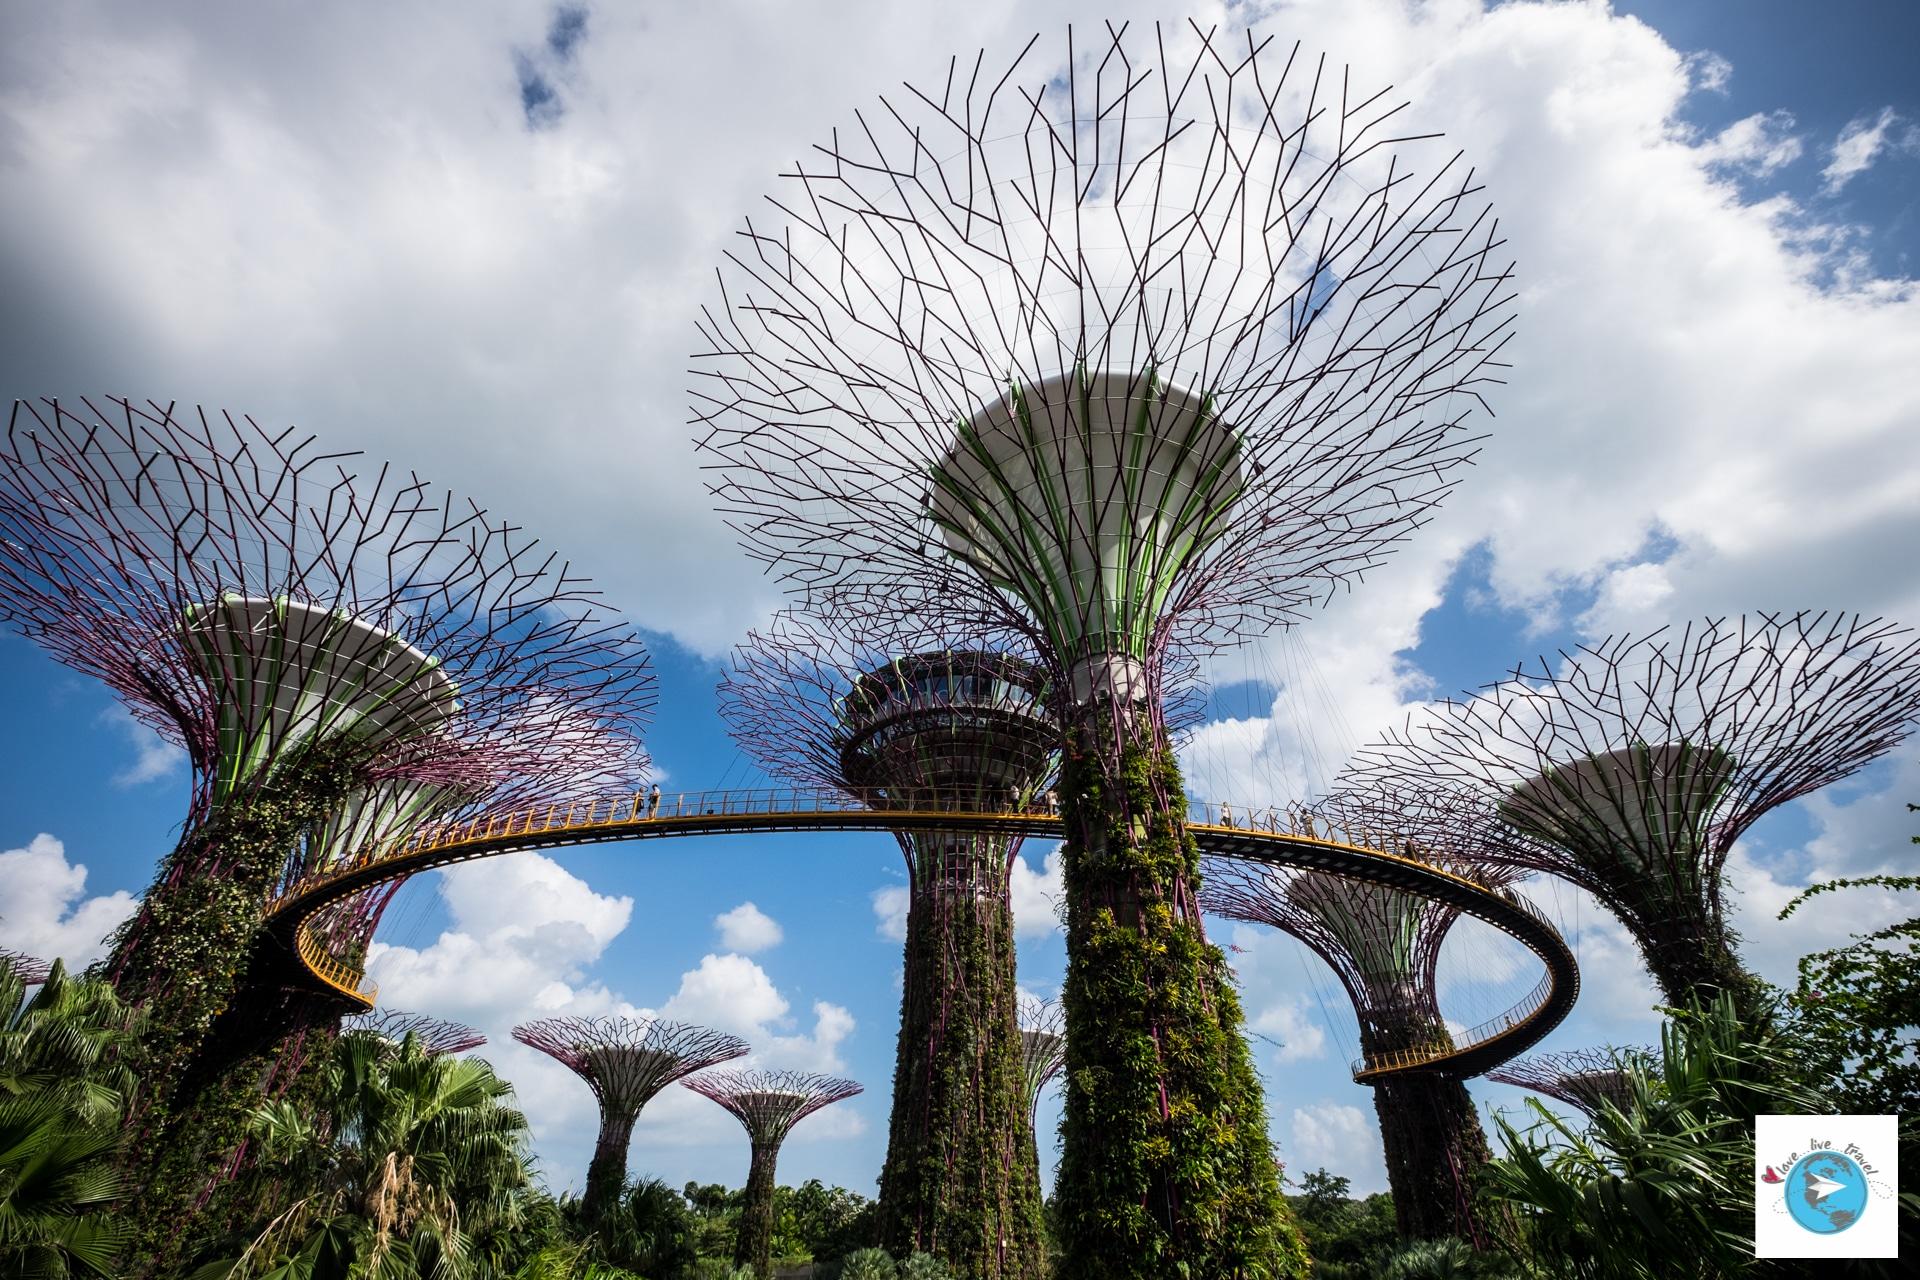 Marina bay singapour for Singapour marina bay sands piscine